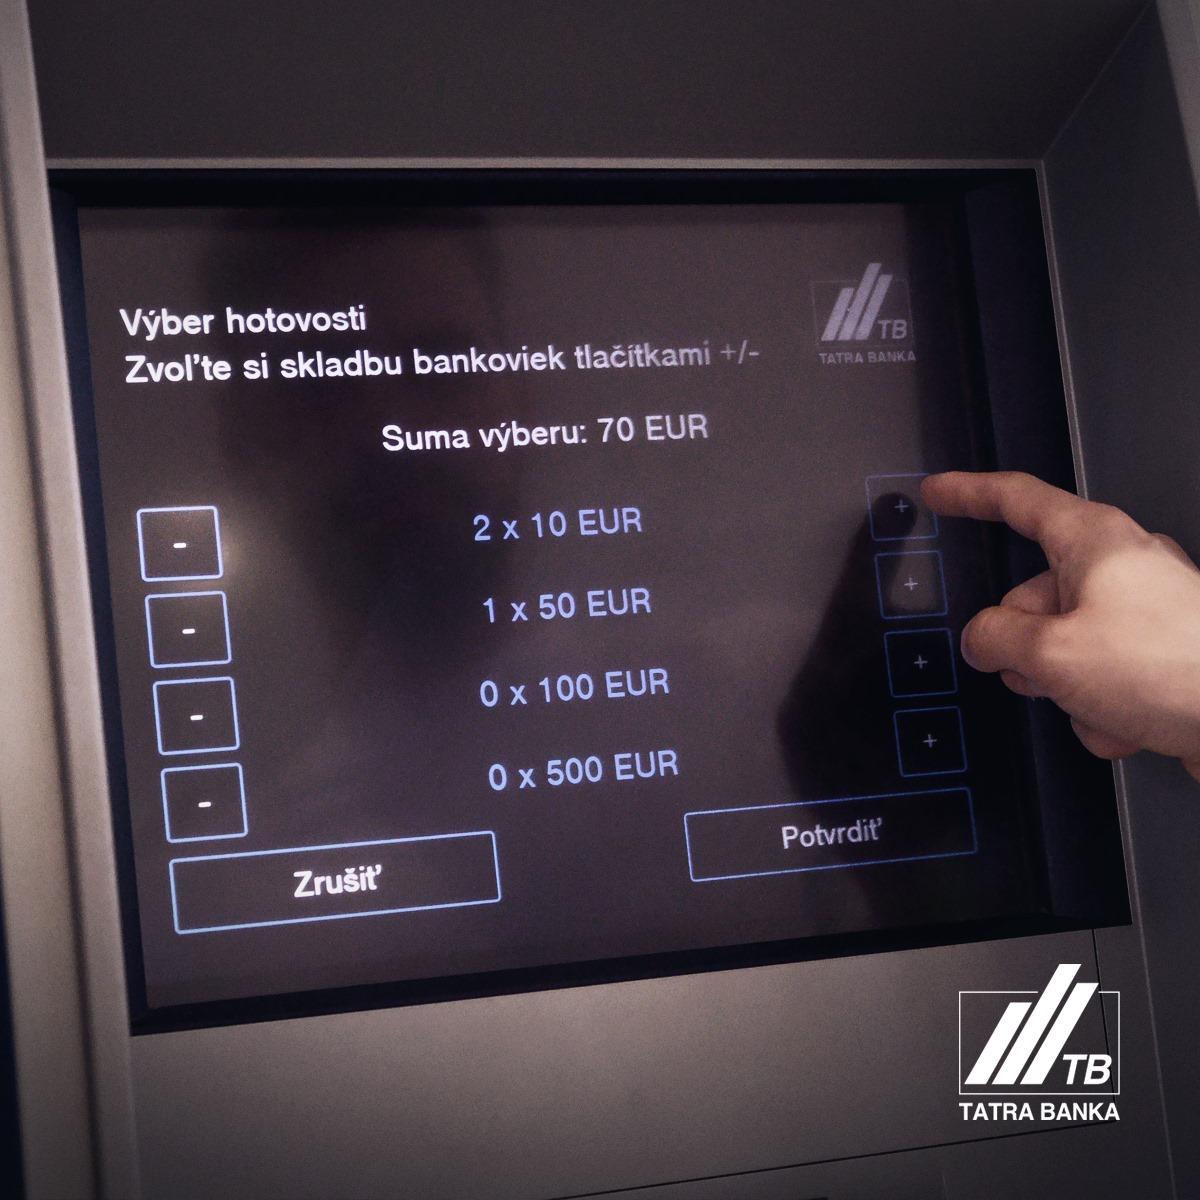 tatra banka bankomat